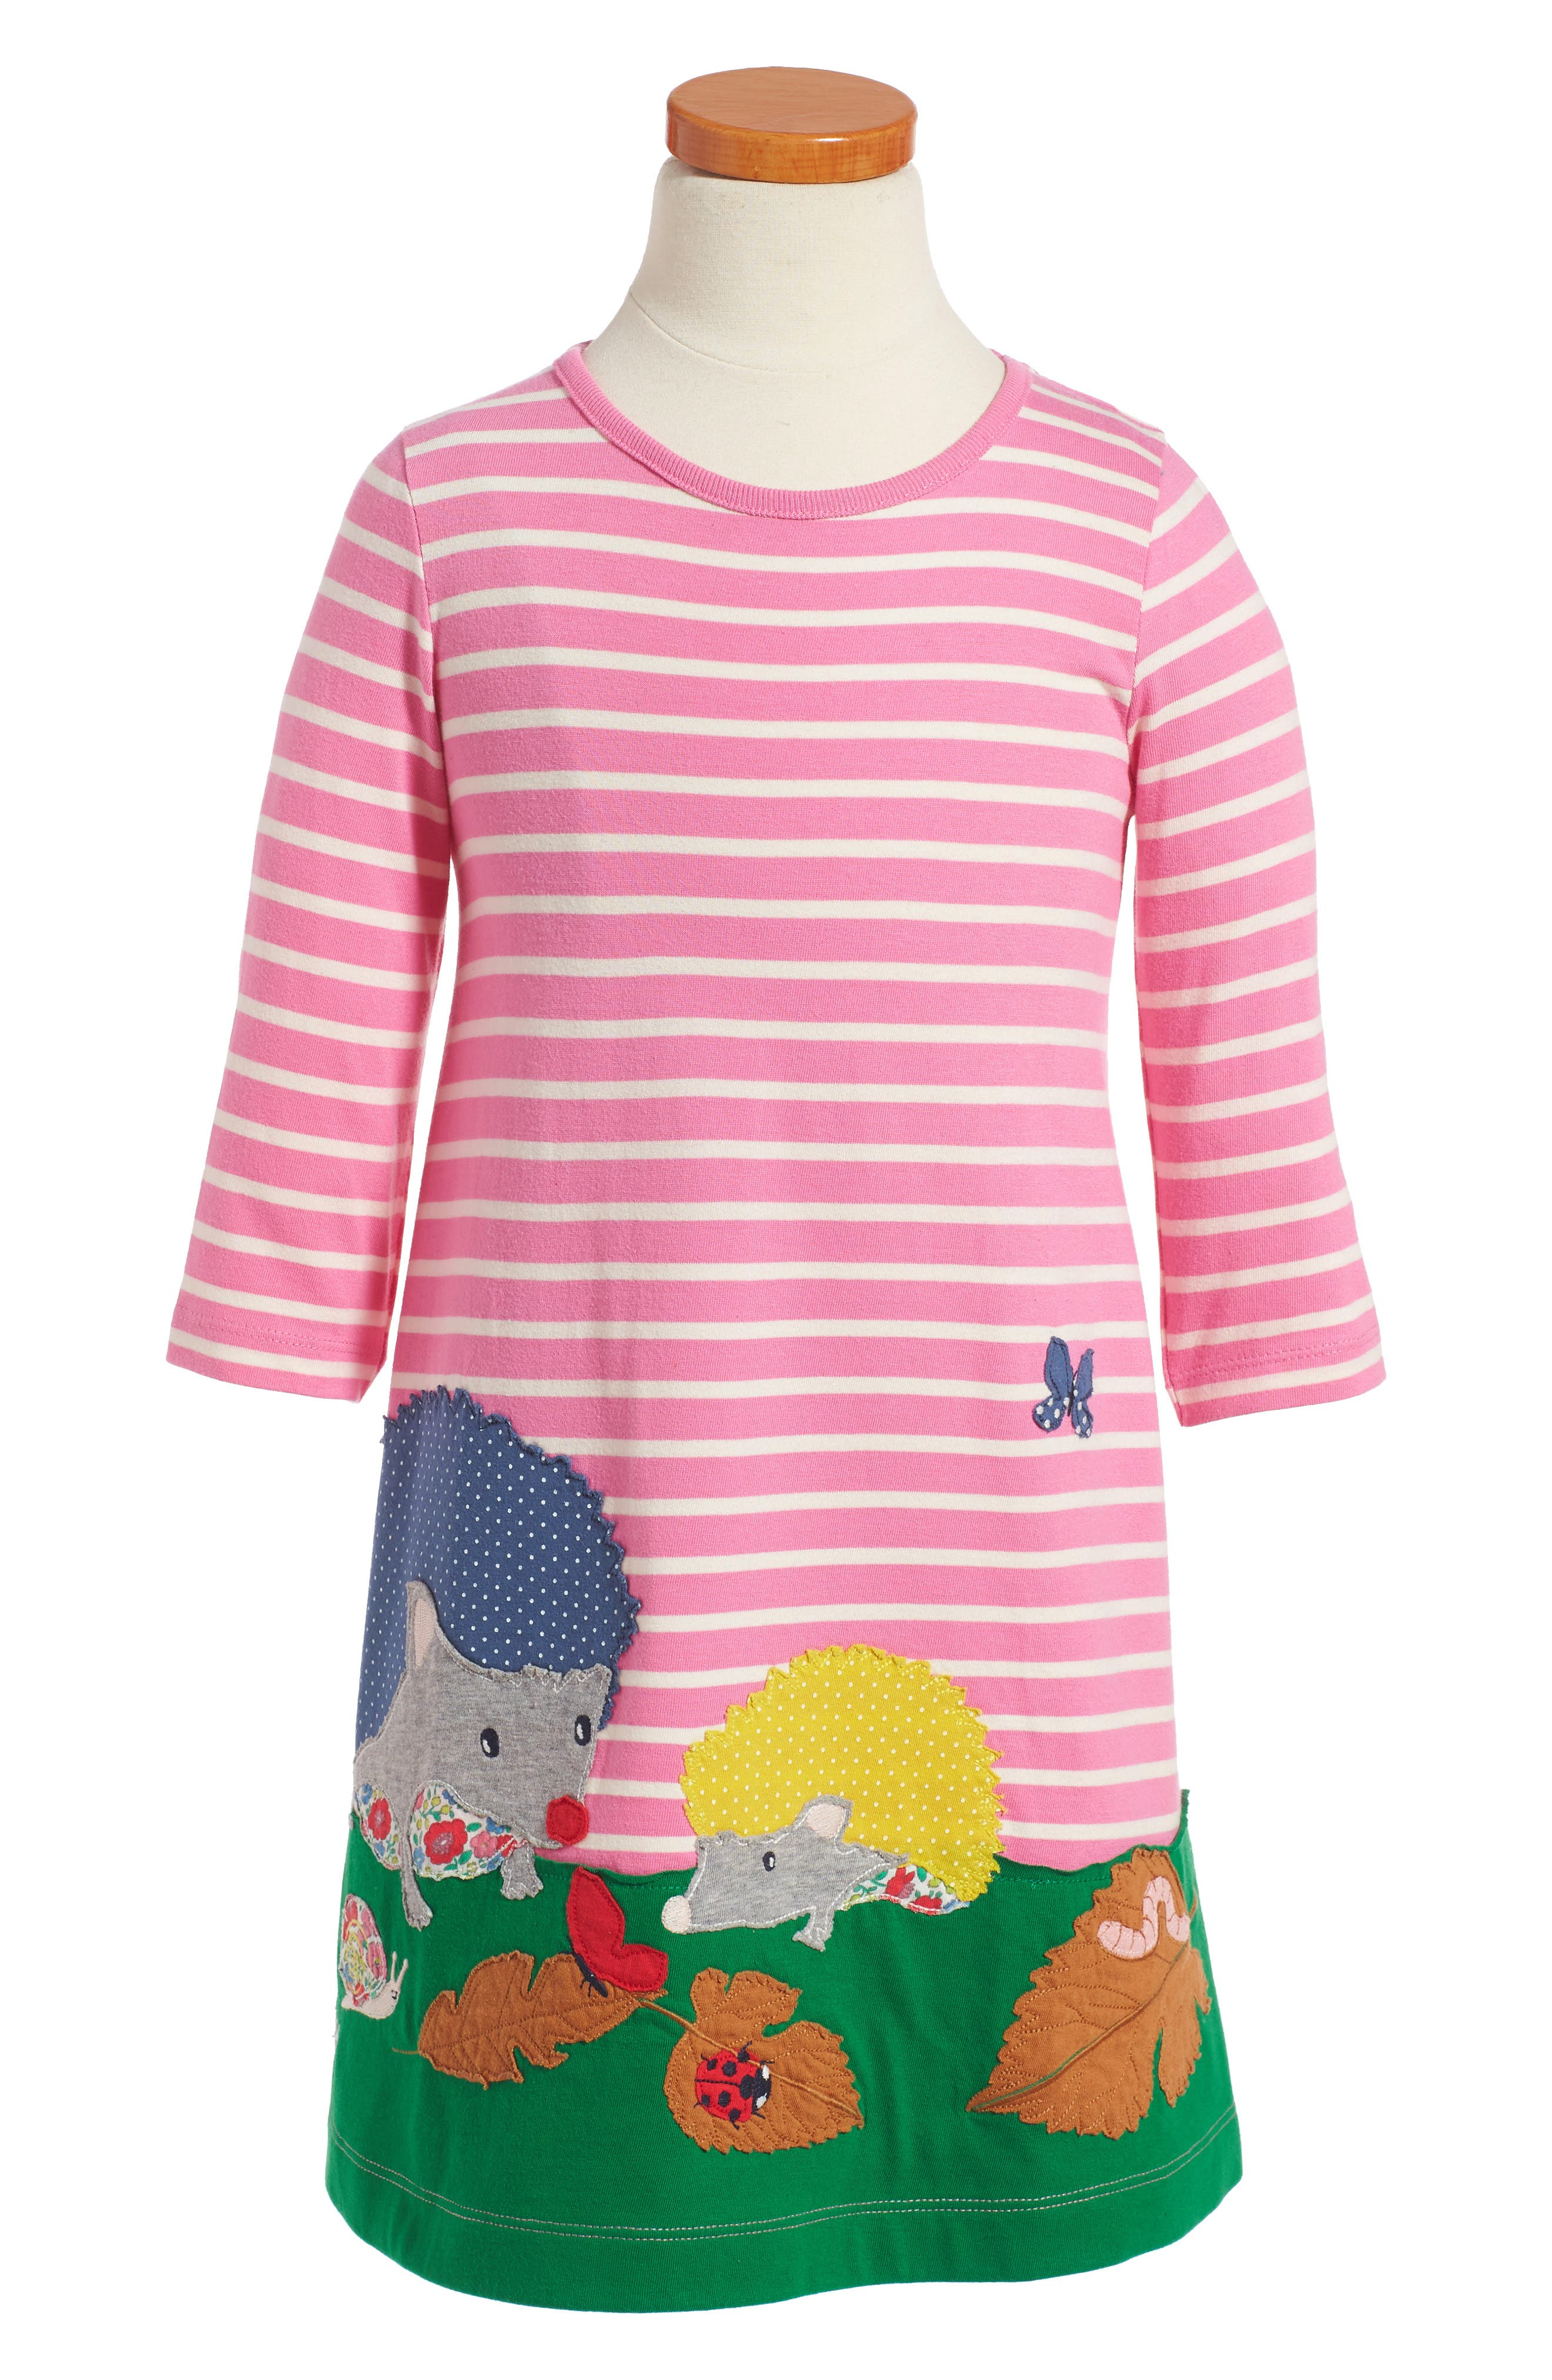 Woodland Friends Dress,                         Main,                         color, Pink Plum Blossom